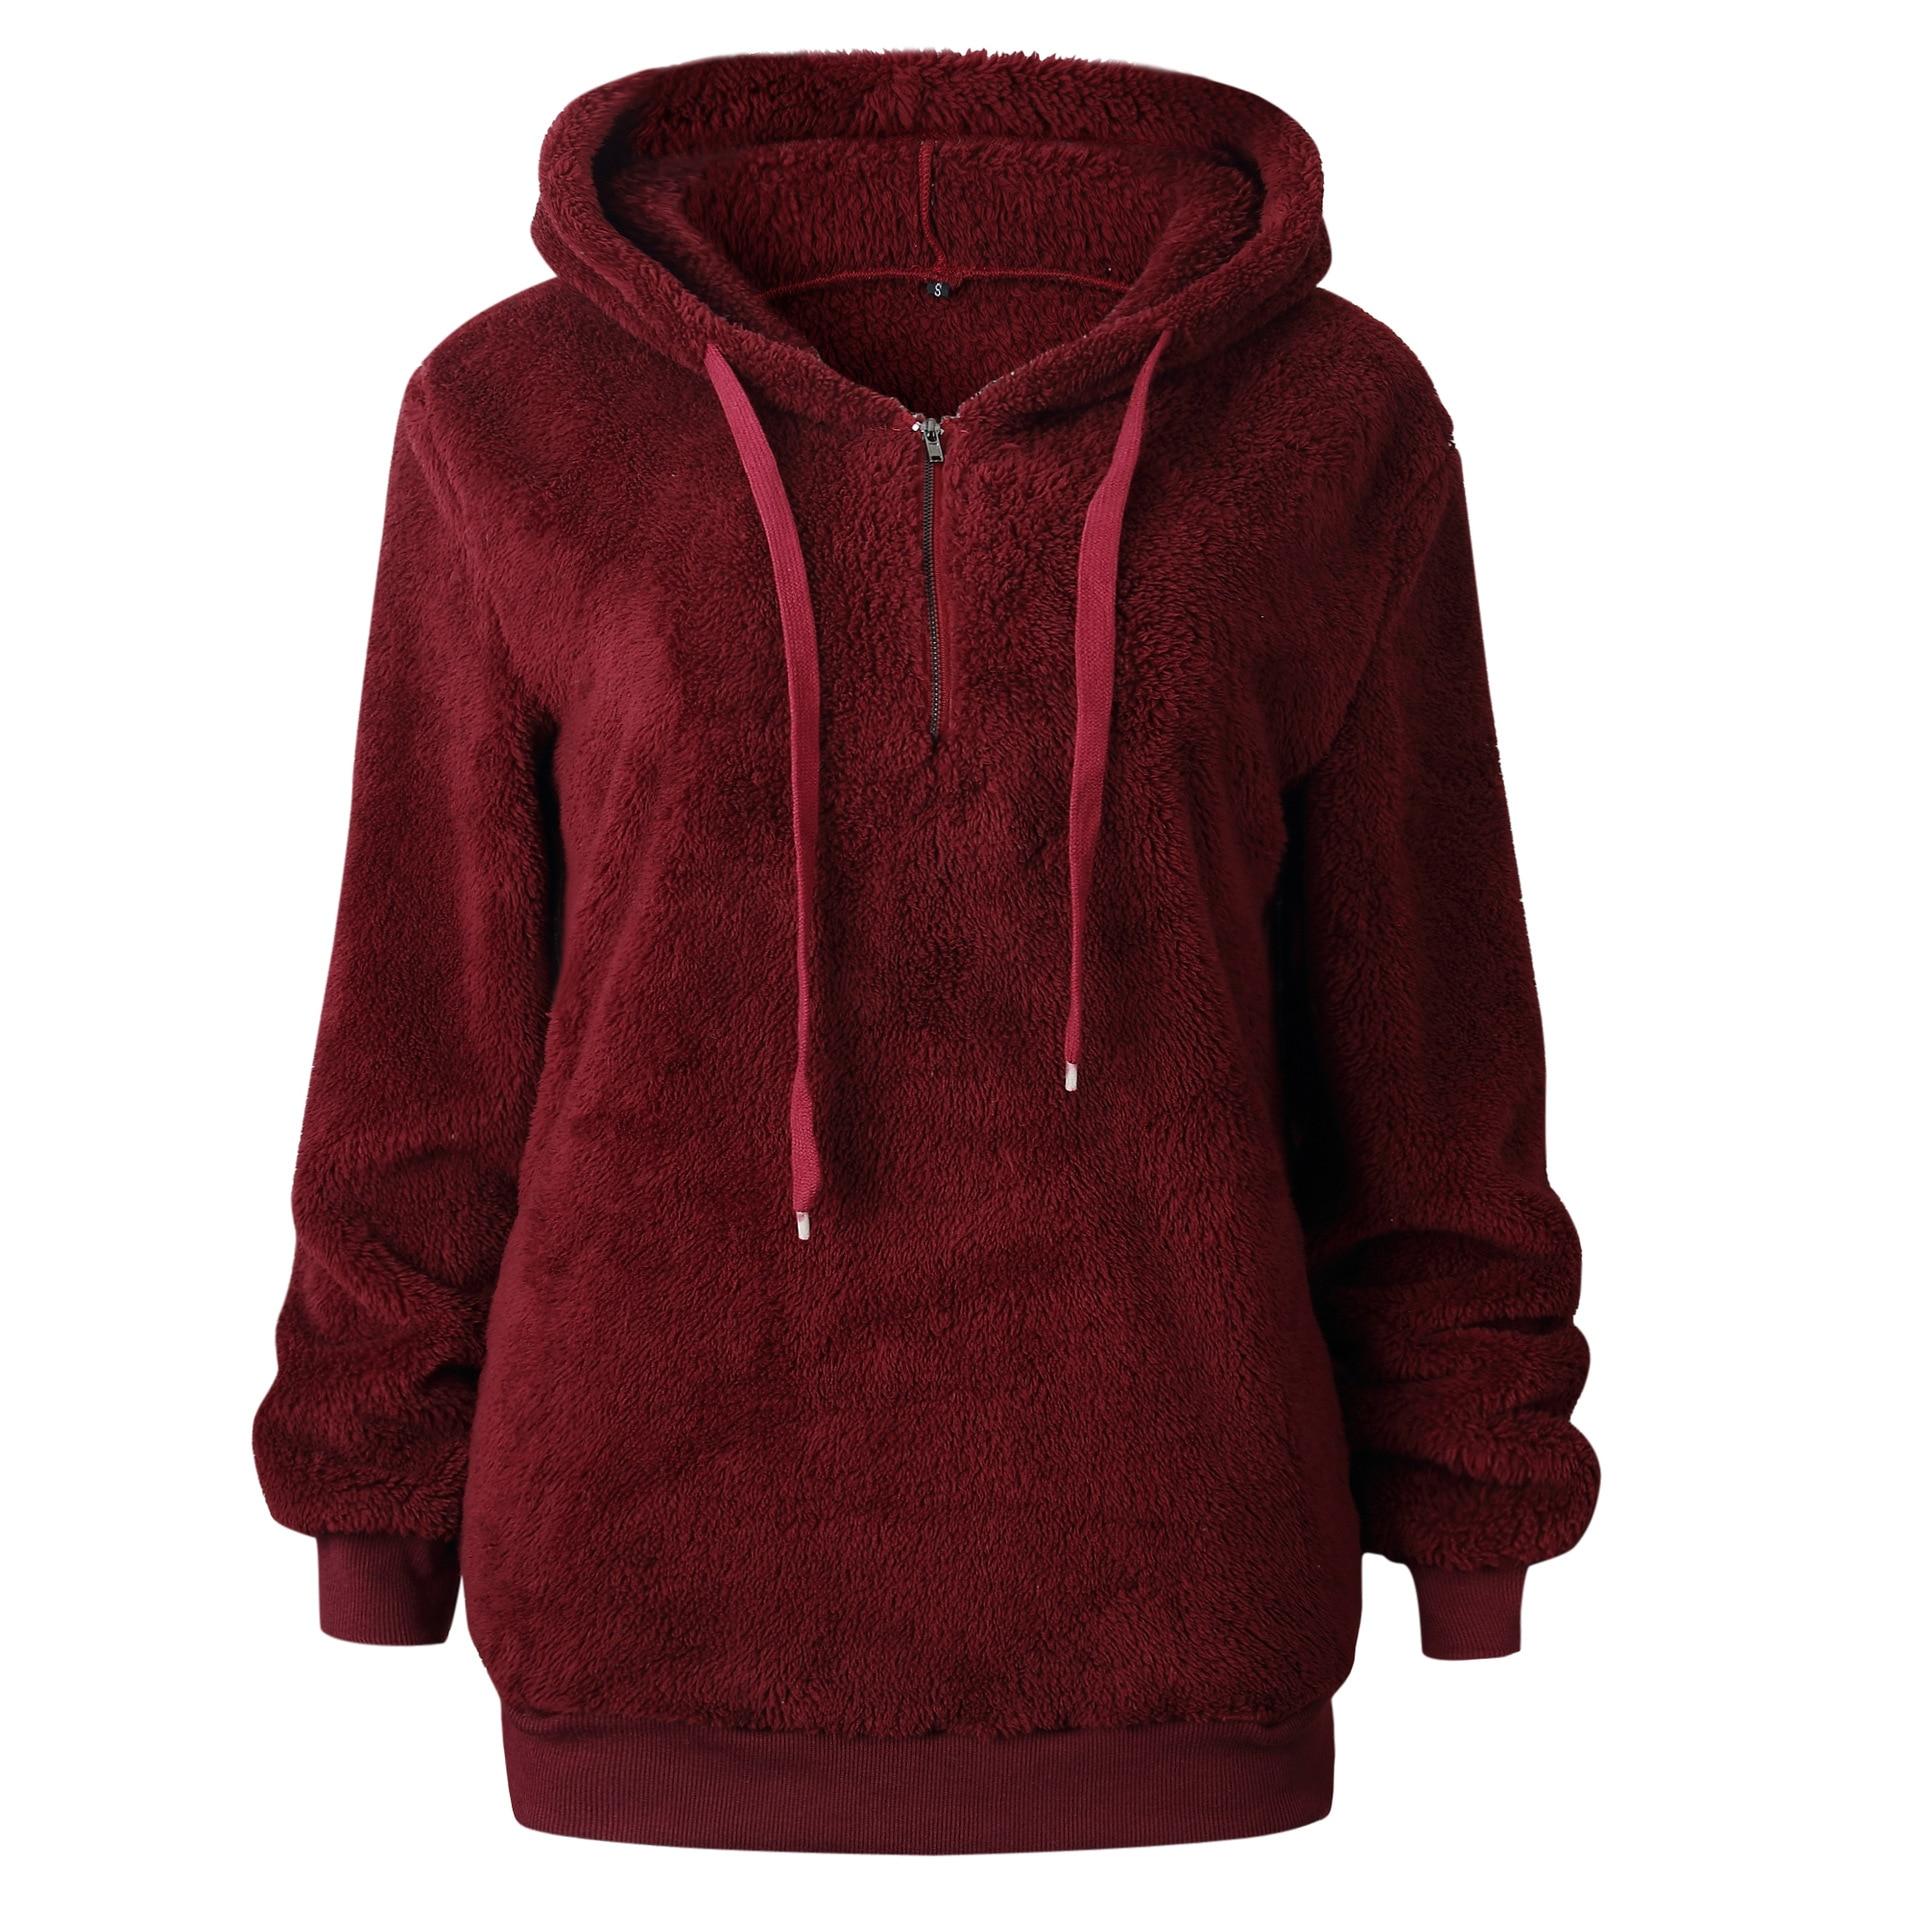 2019 Autumn Female Pullover Women Hoodies Solid Loose Drawstring Sweatshirt Long Sleeve GRAY22 1